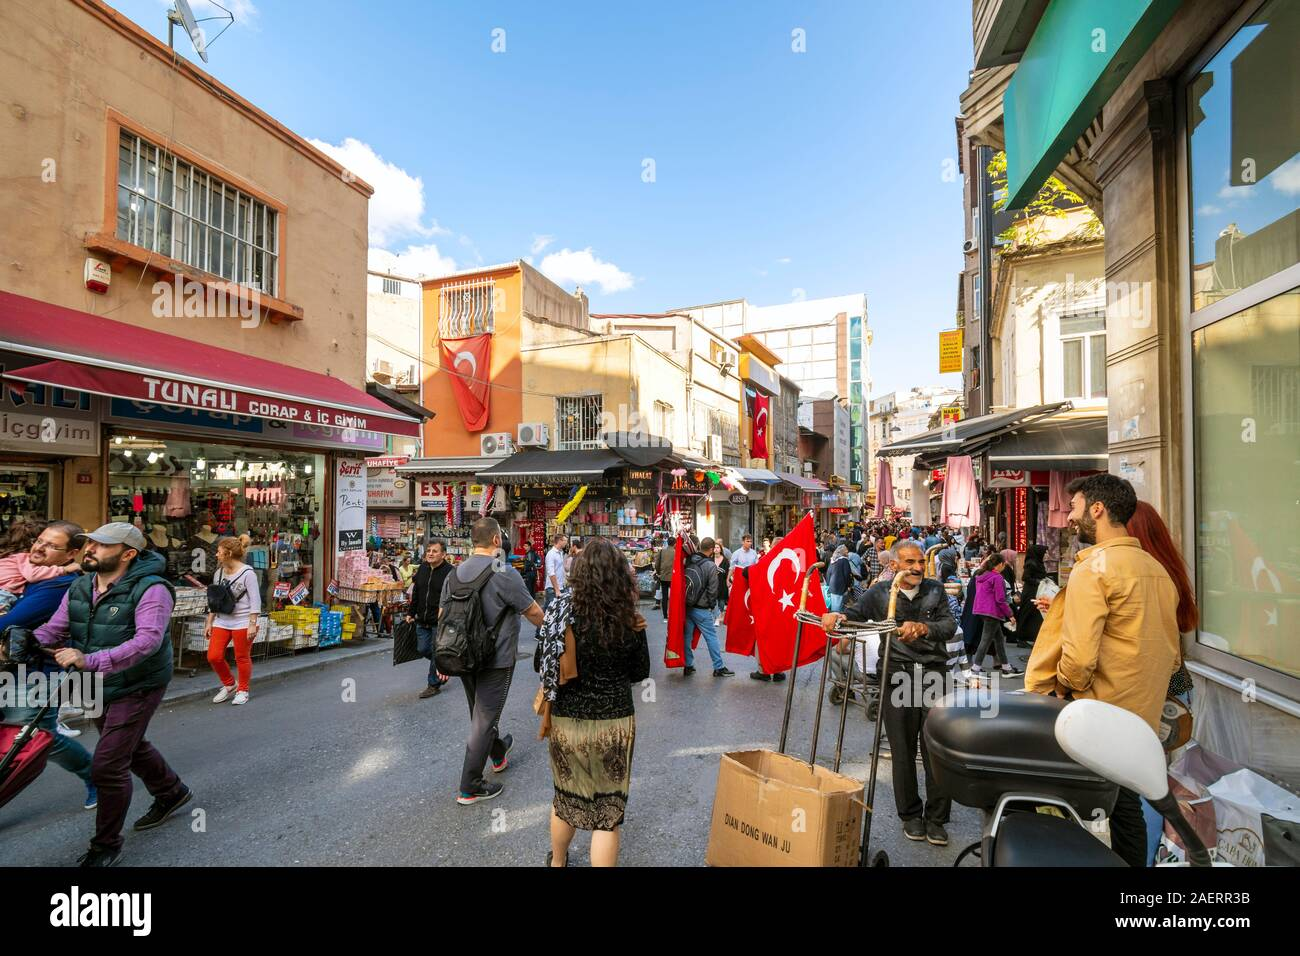 Local Turks shopping the large Eminonu outdoor market bazaar as they walk near a flying Turkish Flag in Istanbul, Turkey Stock Photo